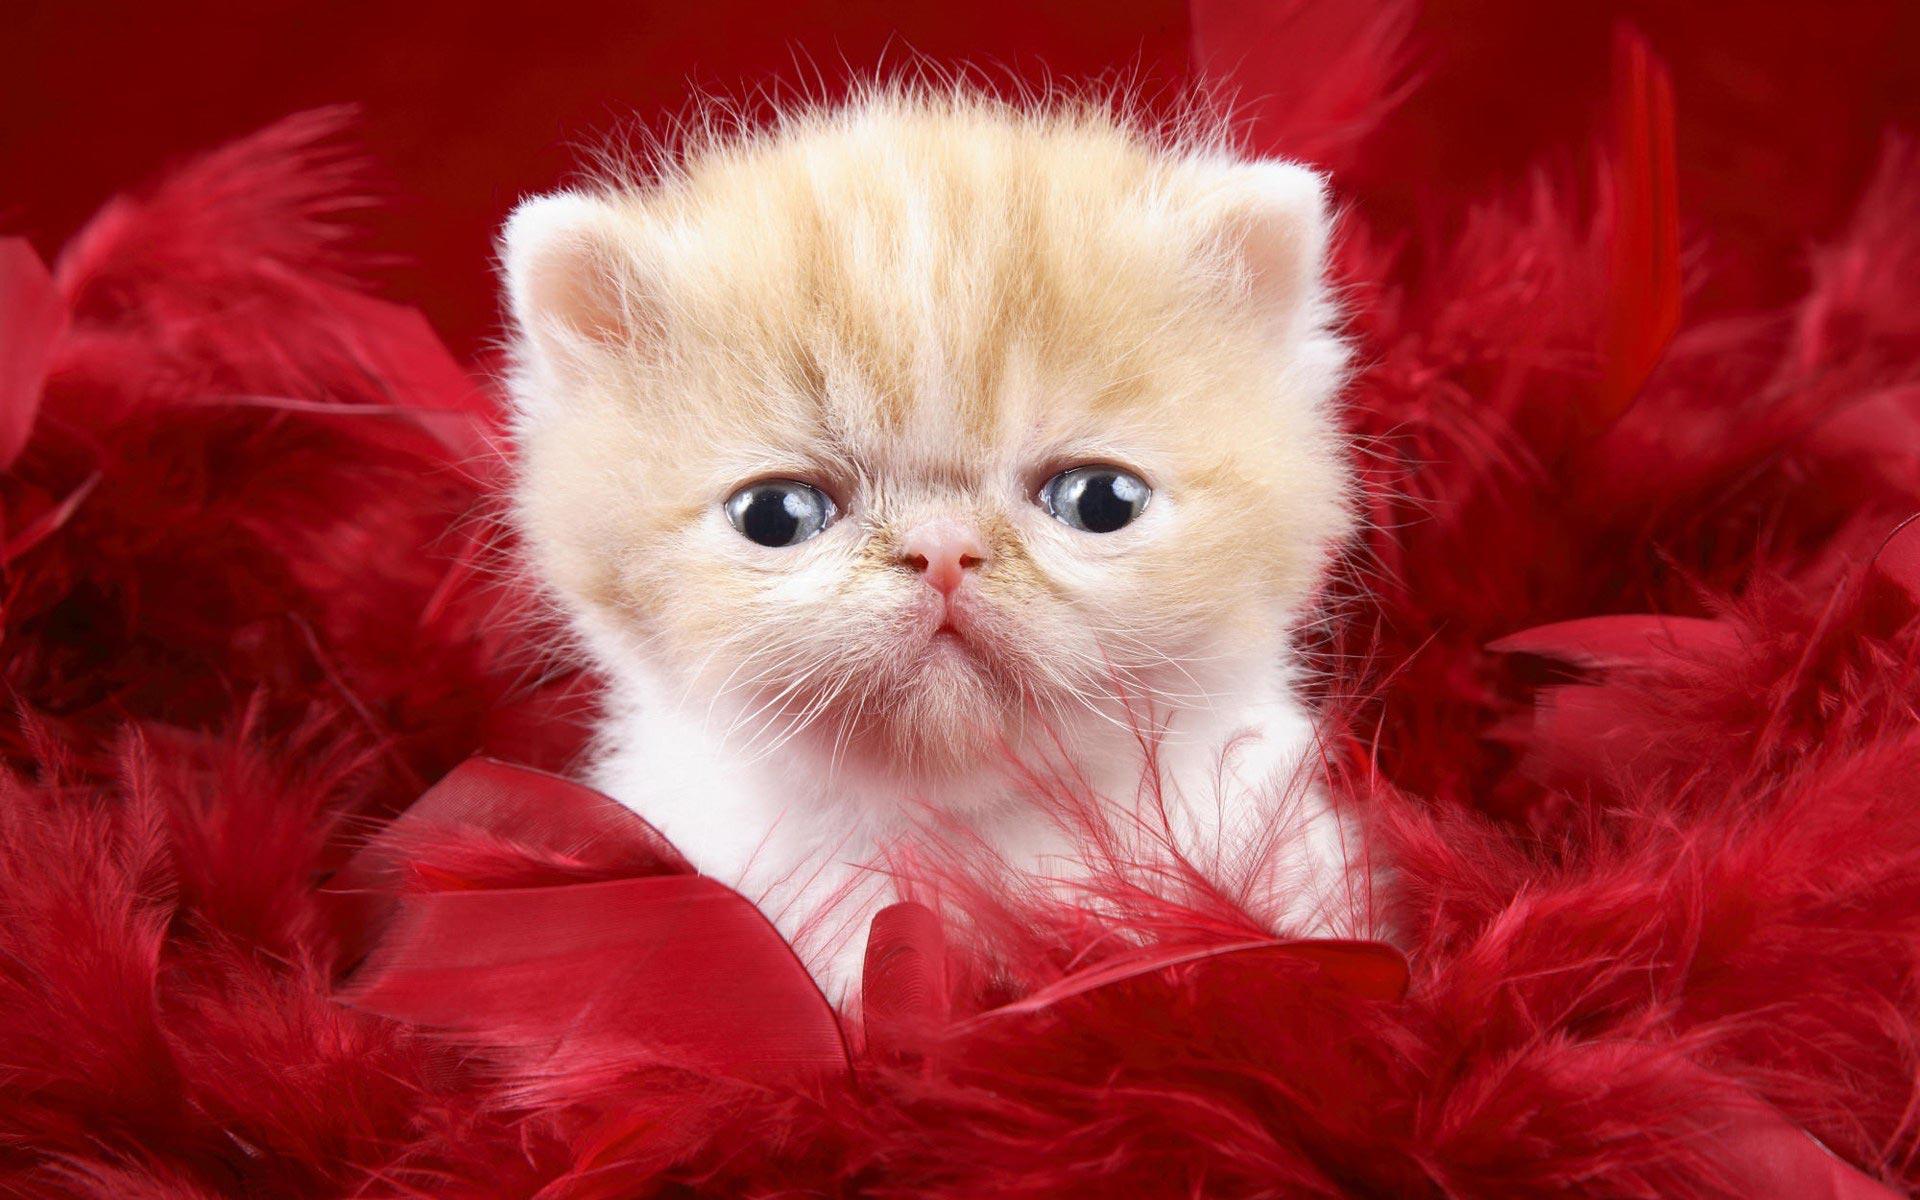 Funny Kitty HD wallpaper